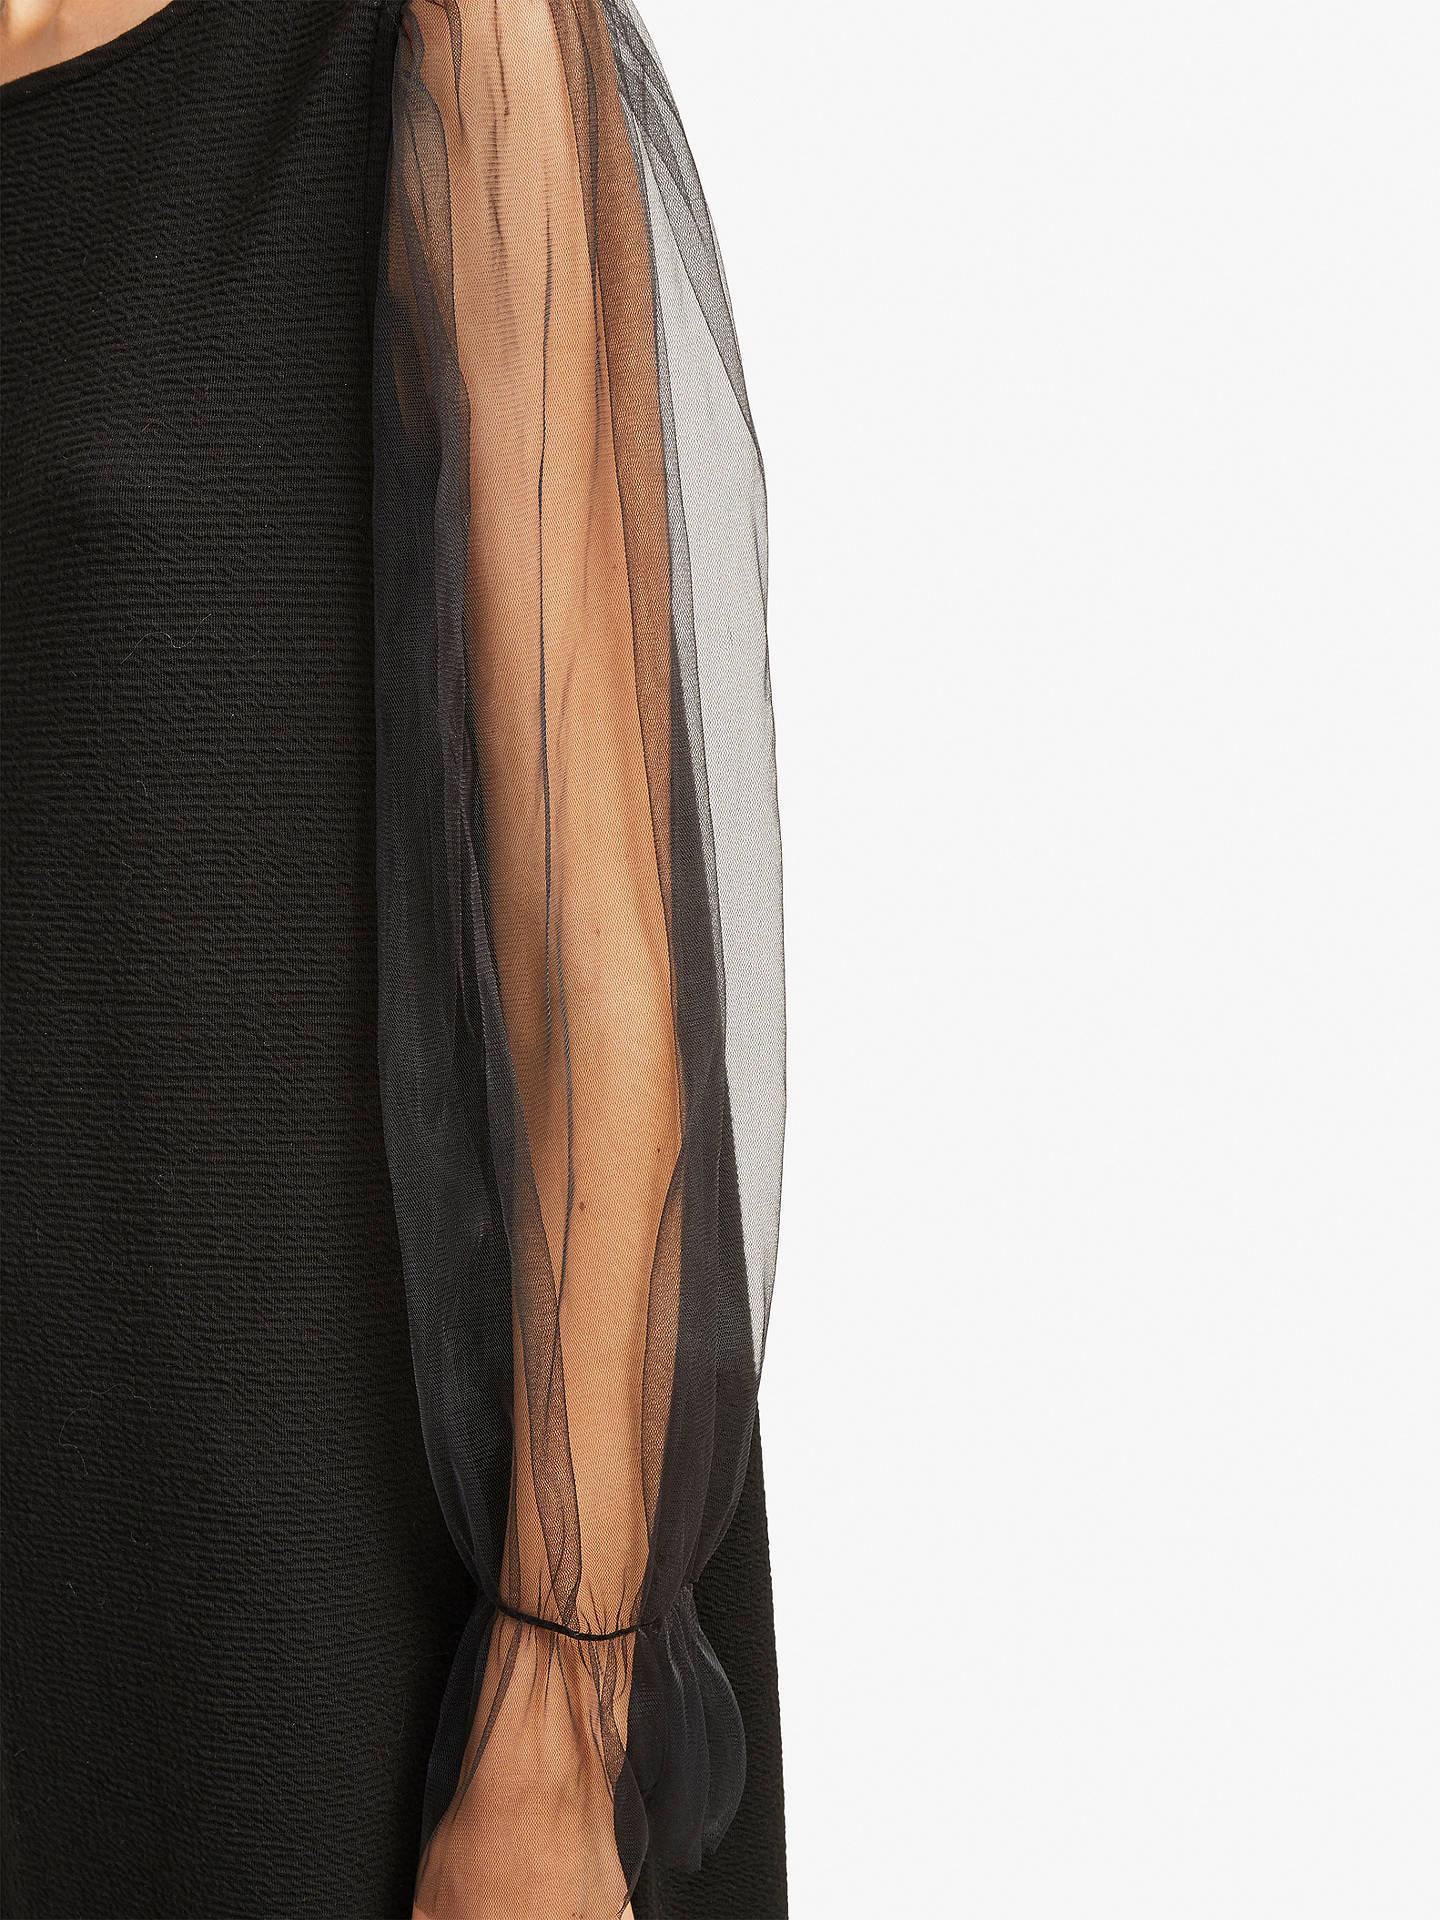 88afb7482ef ... Buy French Connection Sheer Jersey Shift Dress, Black, 6 Online at  johnlewis.com